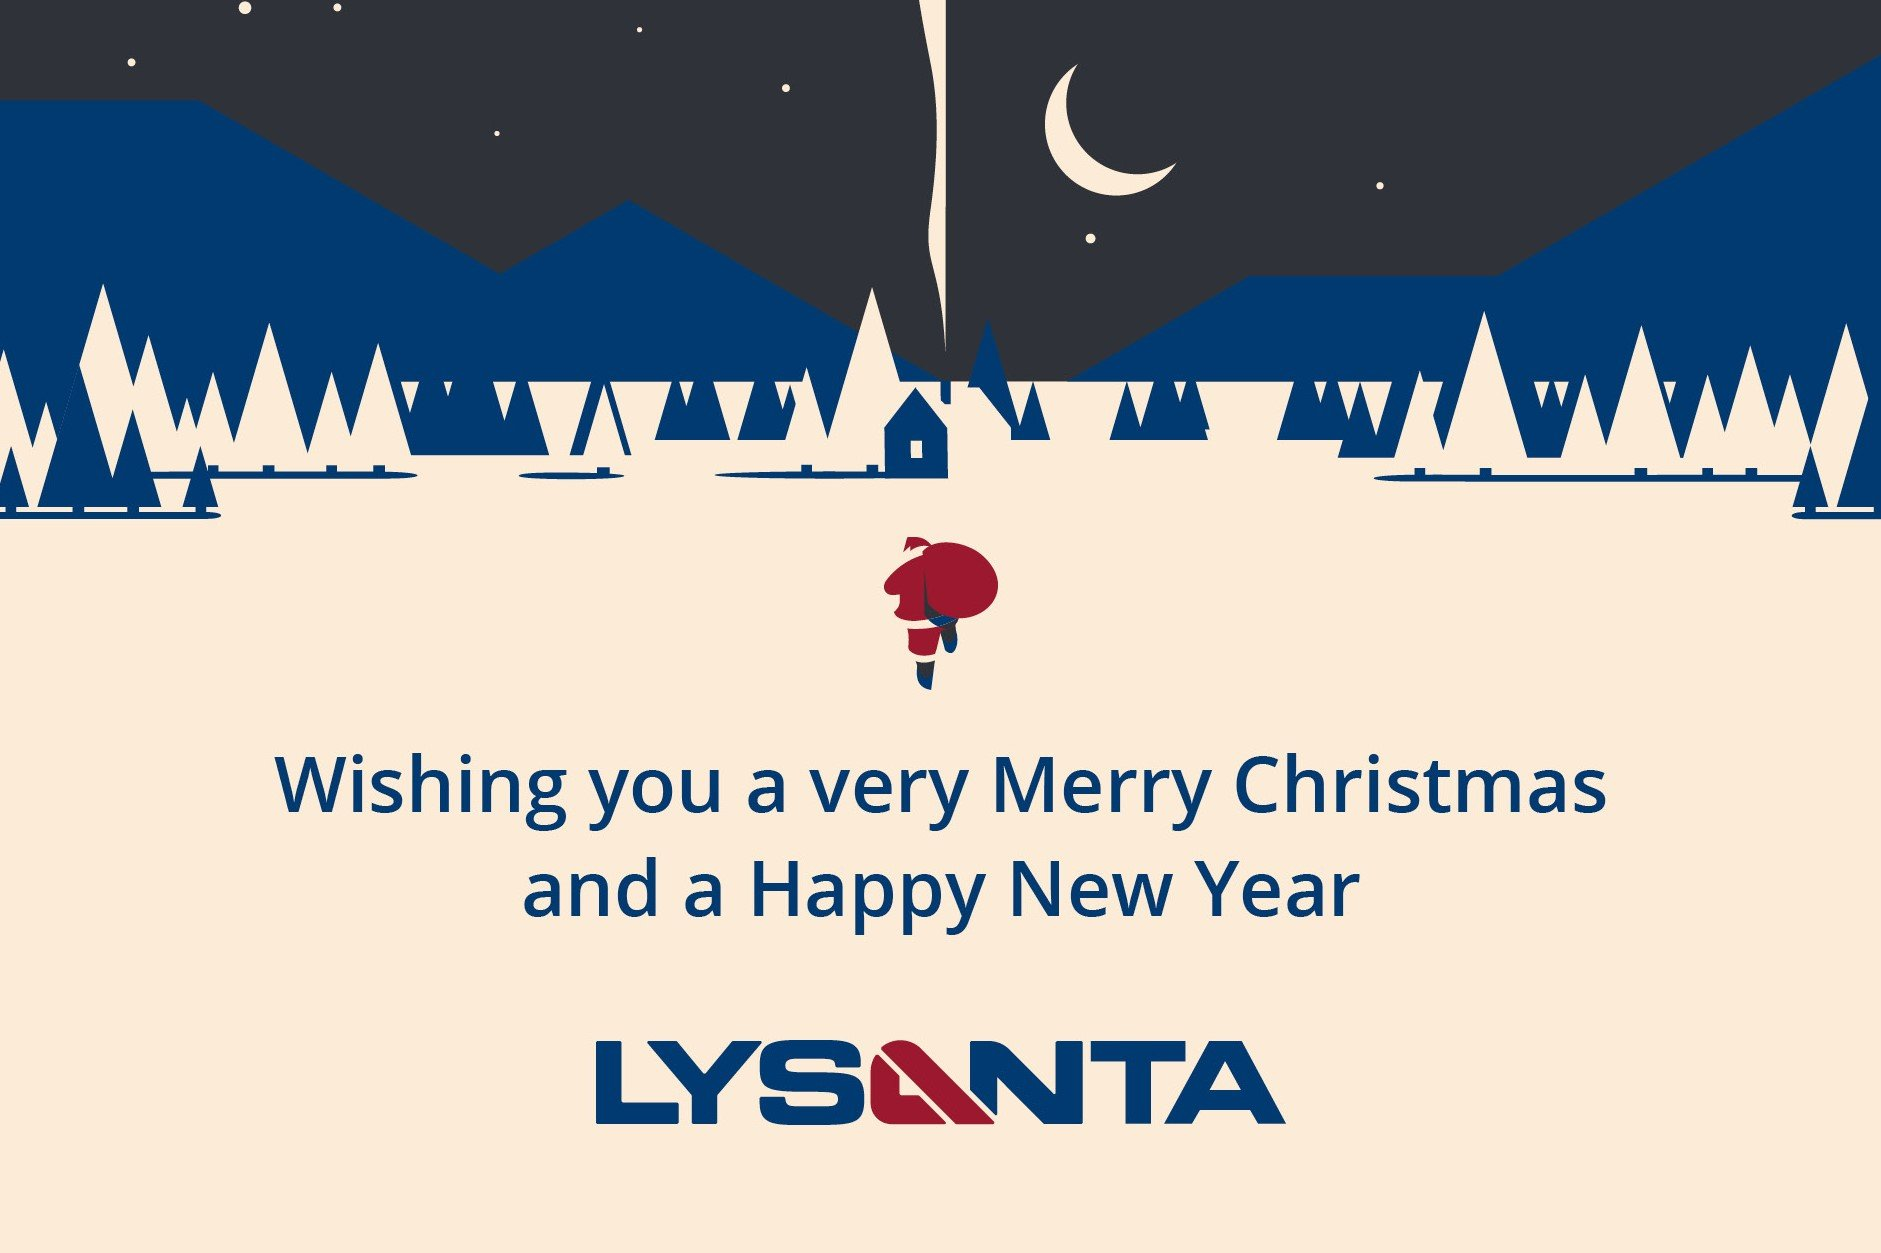 Wishing You A Very Merry Christmas.